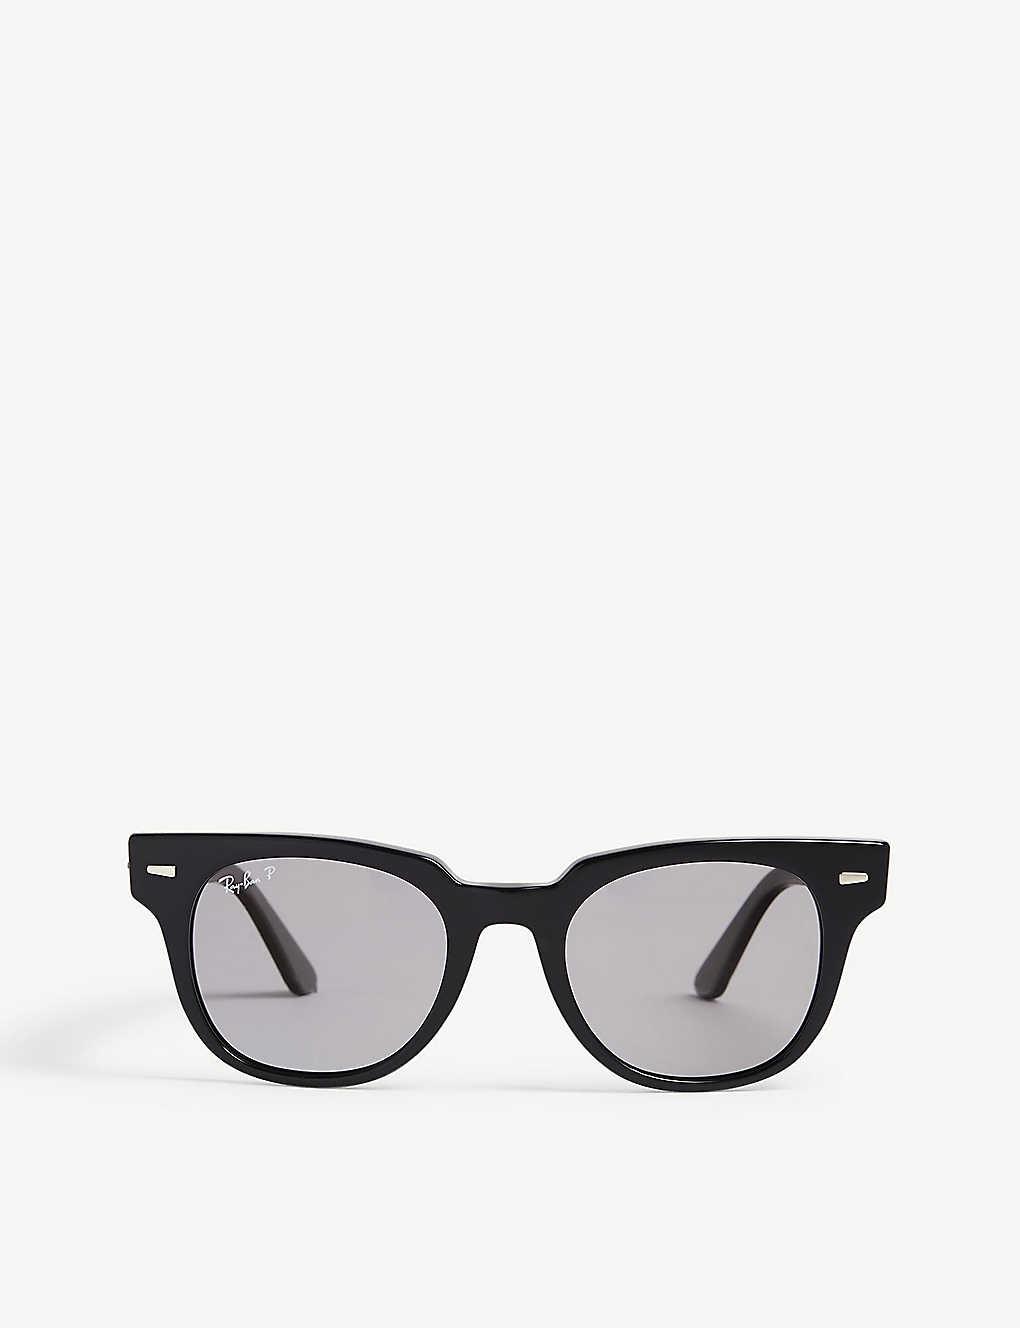 616f7fcf419cd RB2168 Meteor square-frame sunglasses - Black ...